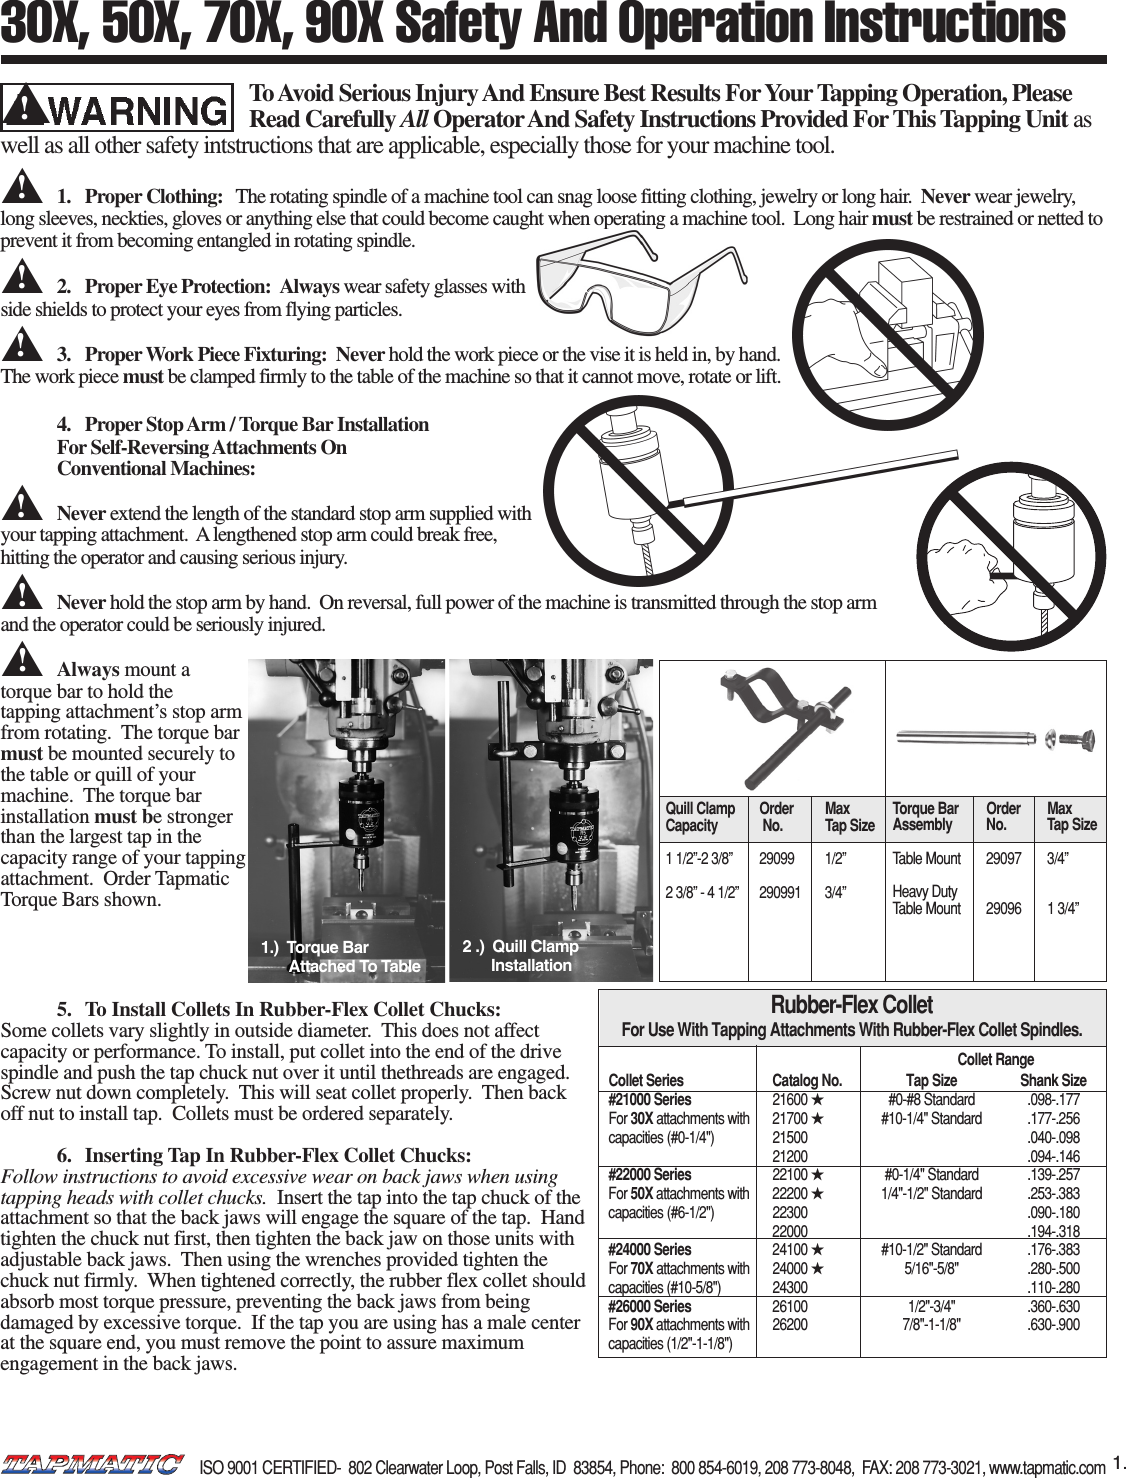 Ewfm User Manual Clark Gcx25 Wiring Diagram 1993 Array Mtrcs Reefer Rh Logoutev De